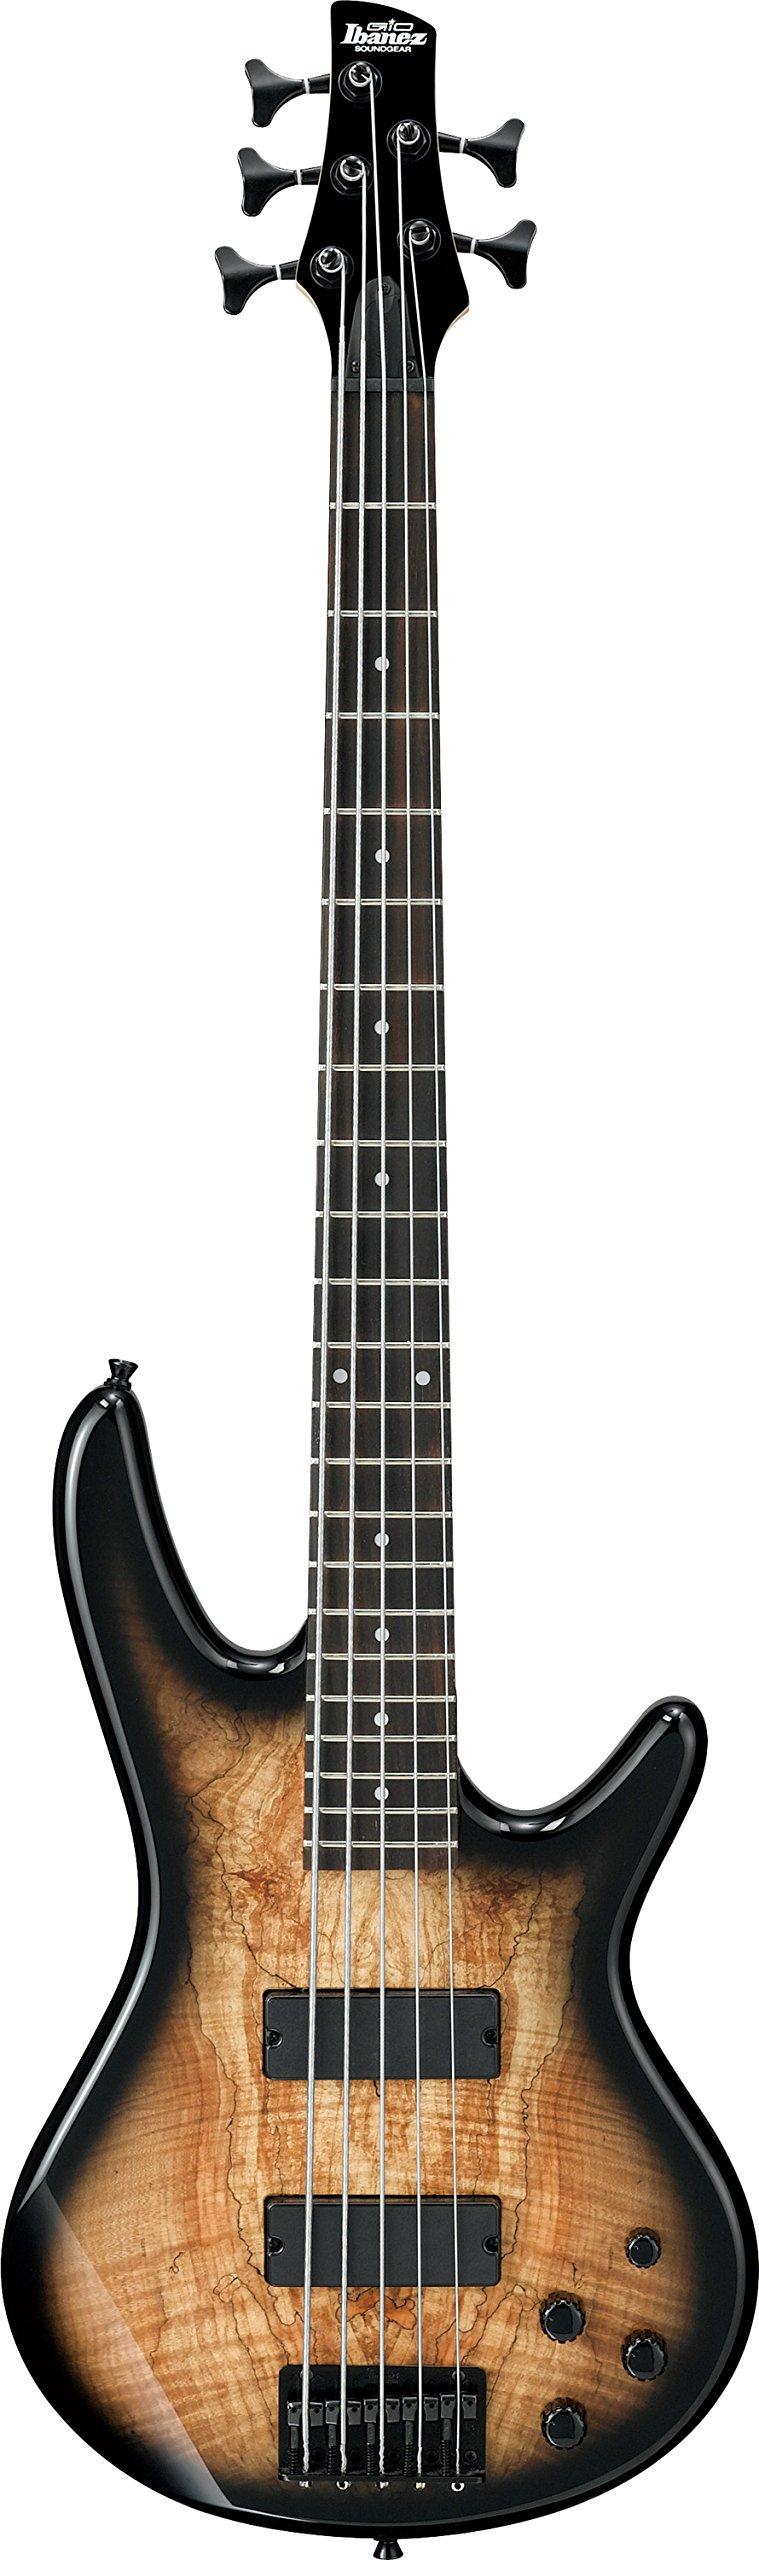 Ibanez 5 String Bass Guitar Right Handed, Natural Gray Burst GSR205SMNGT